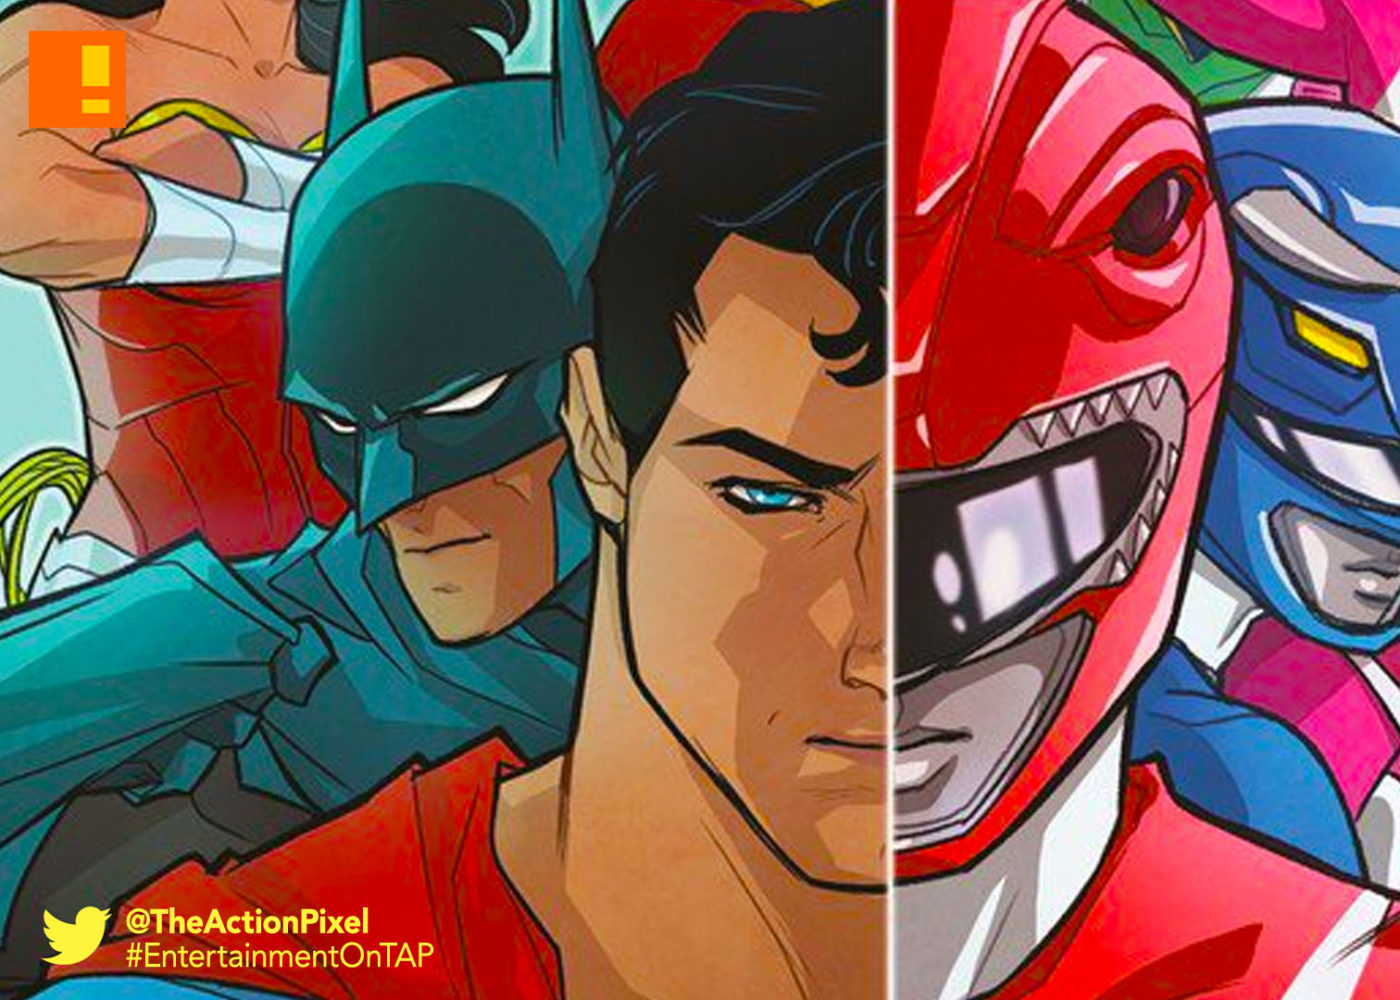 dc, dc comics, boom! studios, boom comics, boom! comics, power rangers, saban, entertainment on tap, the action pixel